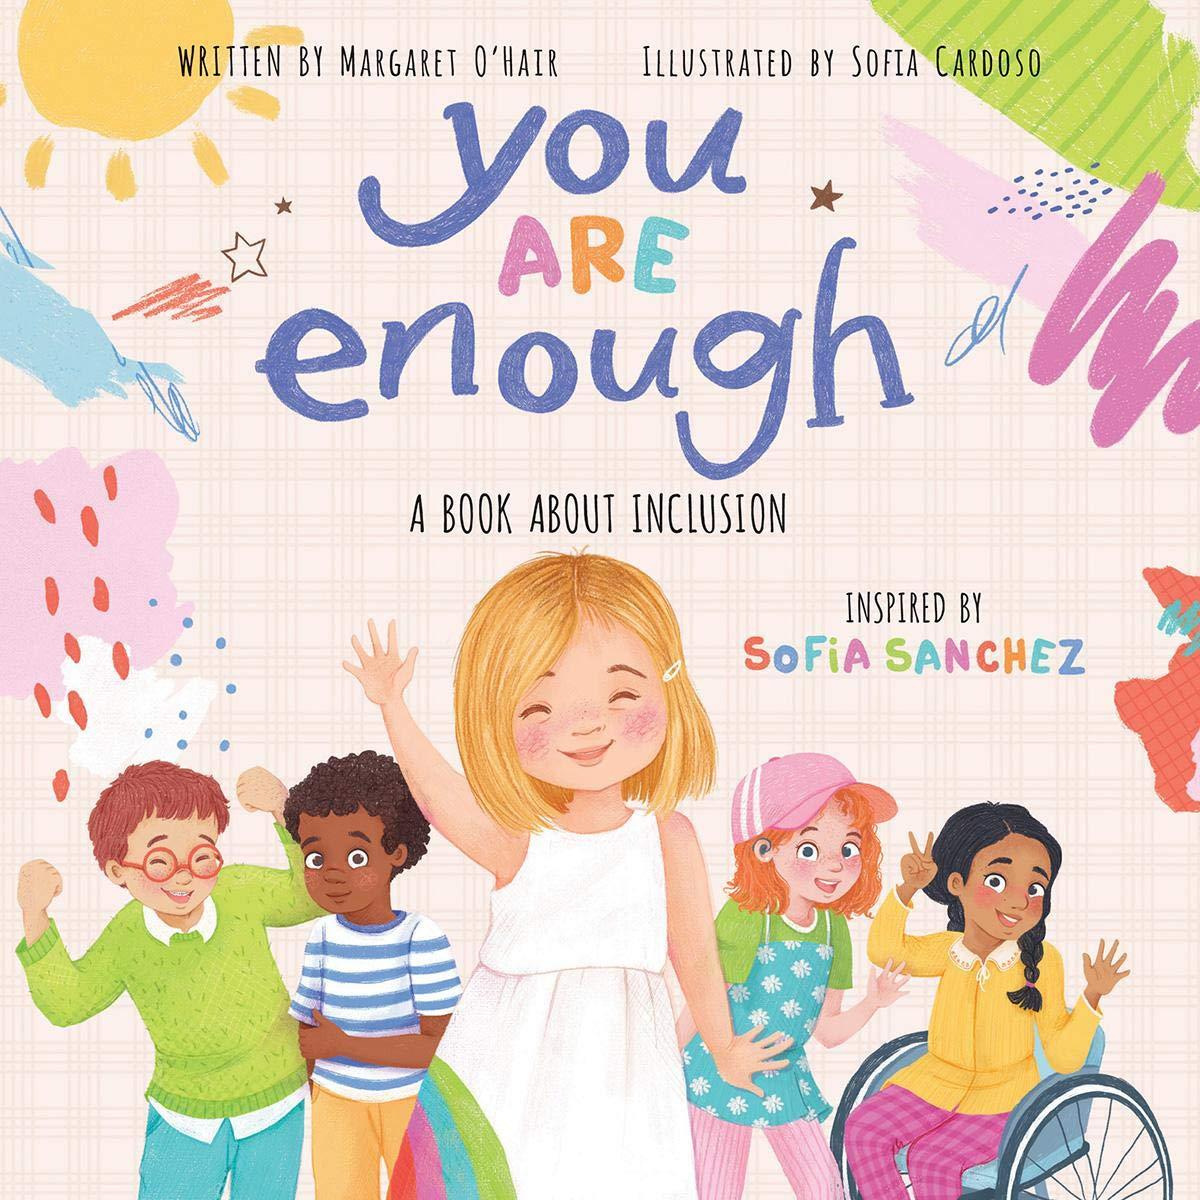 You Are Enough: A Book About Inclusion: O'Hair, Margaret, Sanchez, Sofia,  Cardoso, Sofia: 9781338630749: Amazon.com: Books